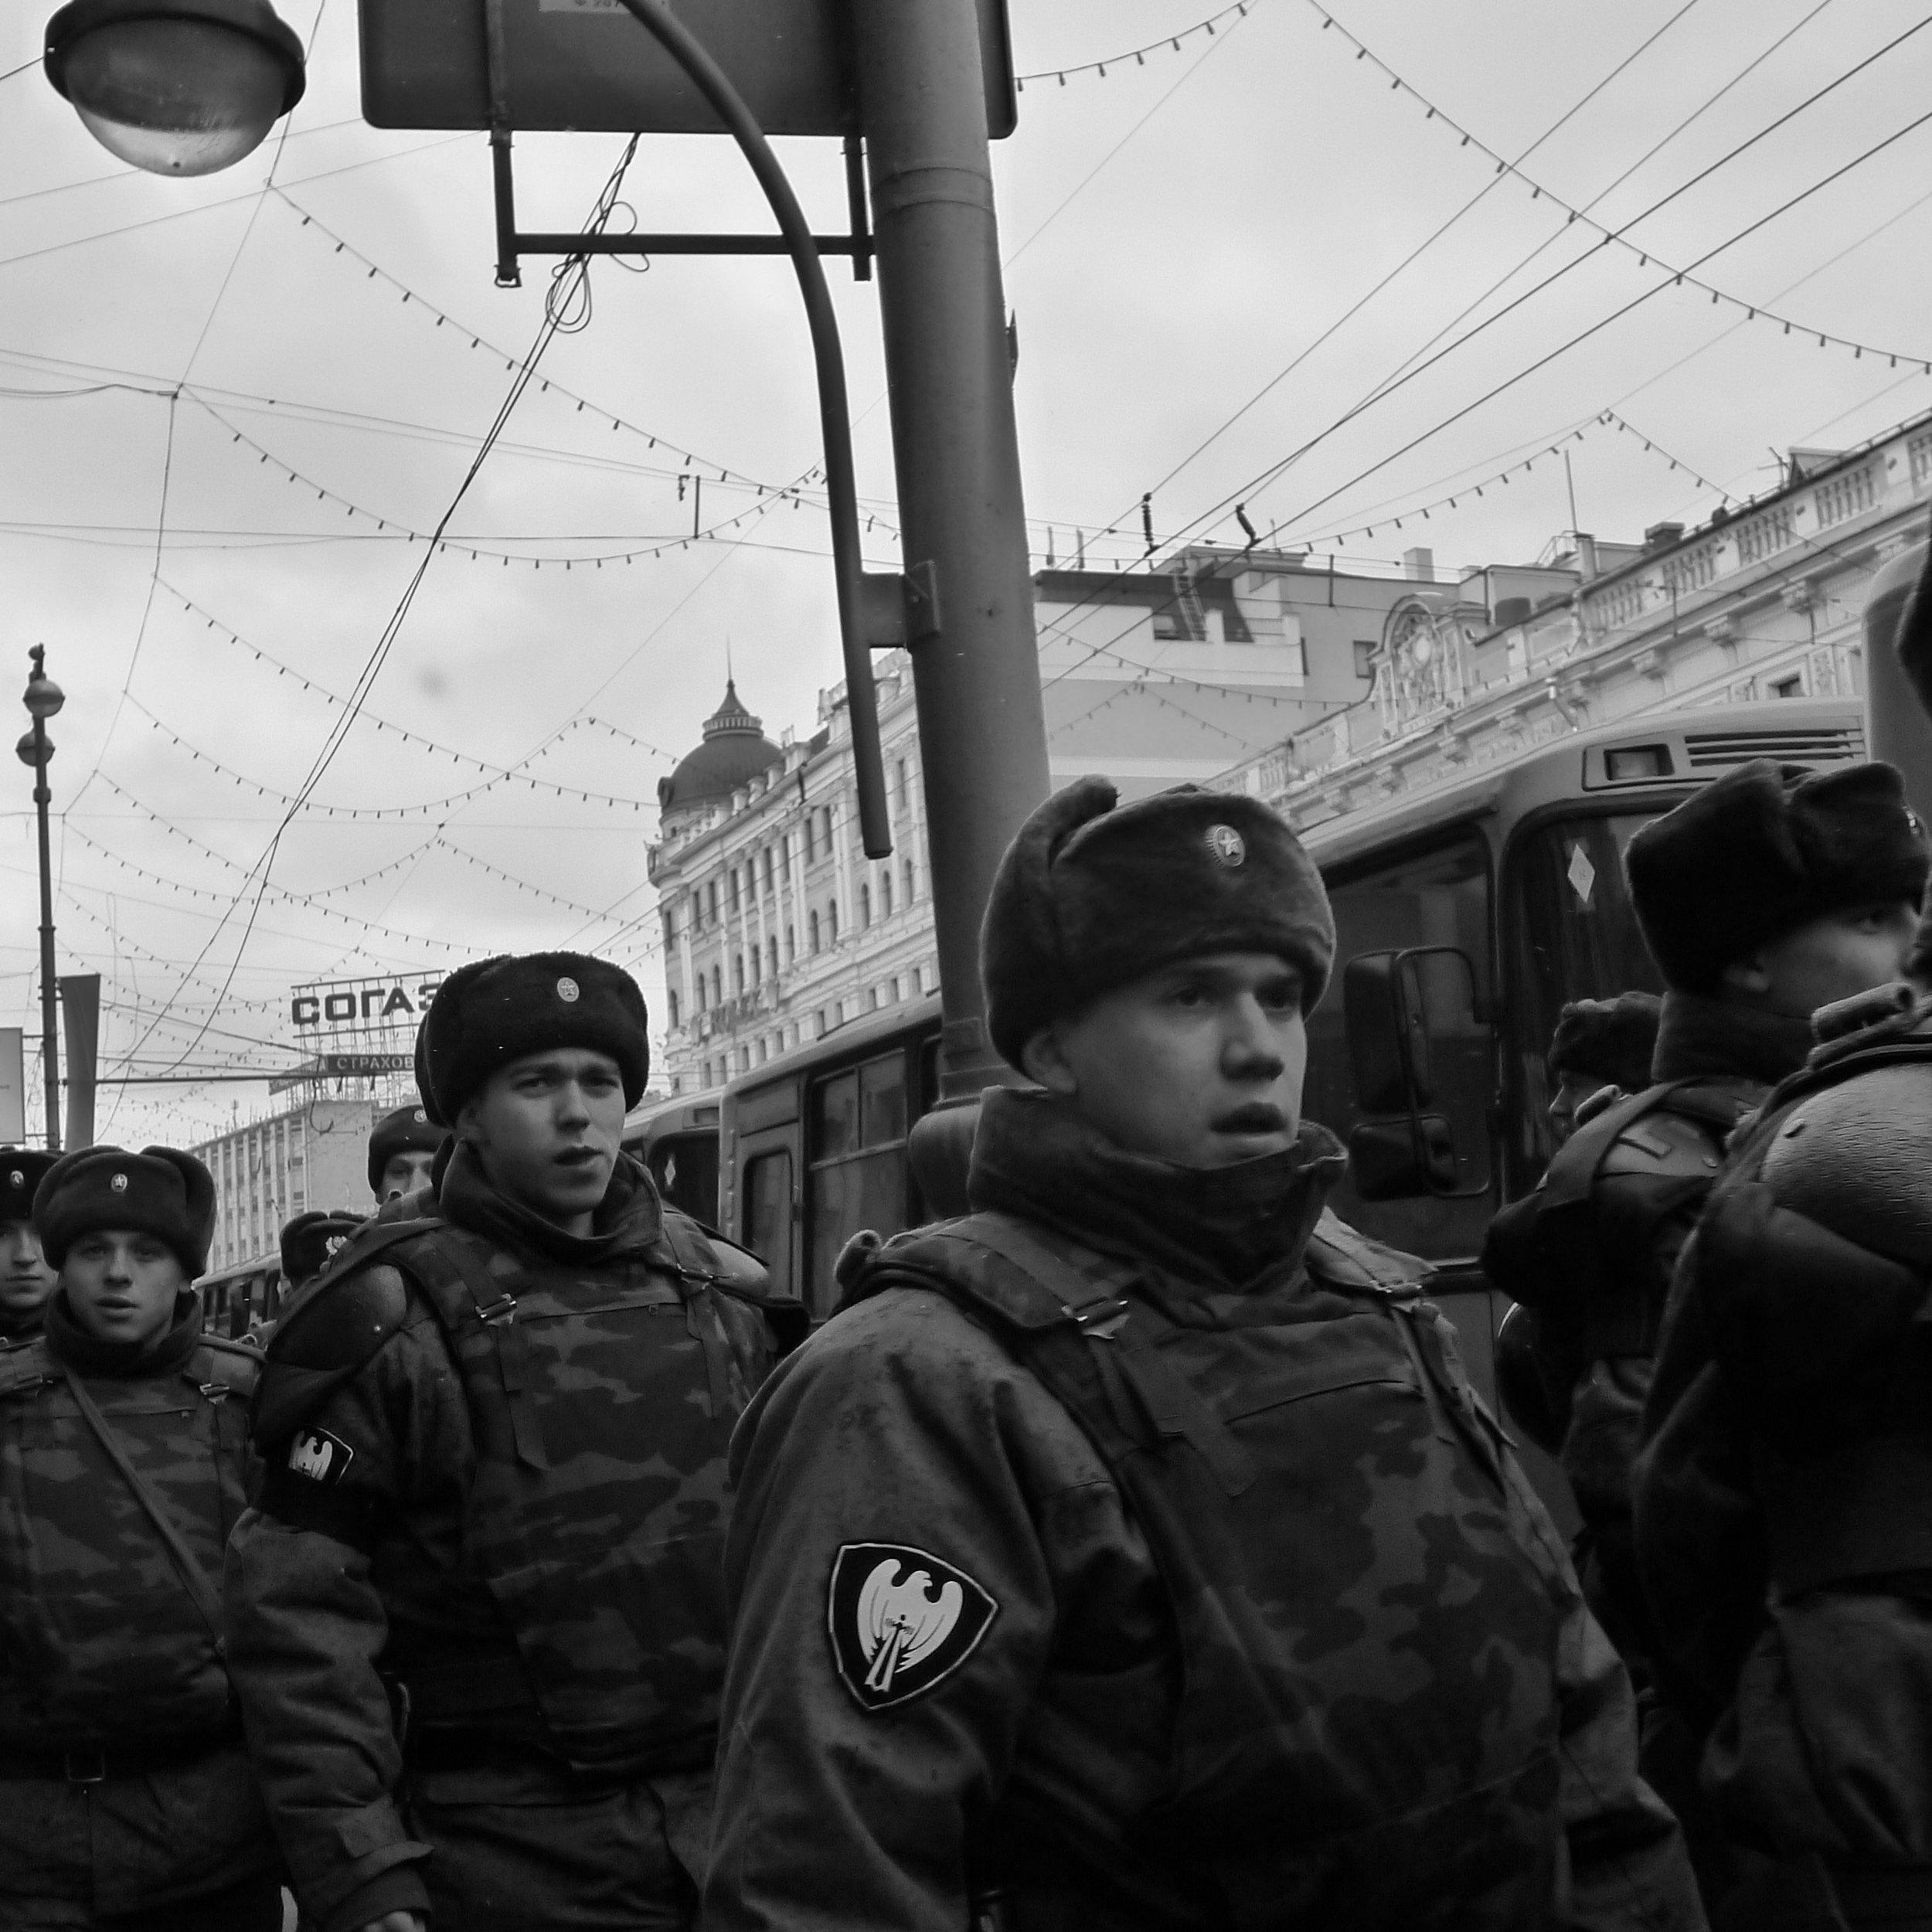 18_Untitled_Moscow_2012_medium-format.jpg